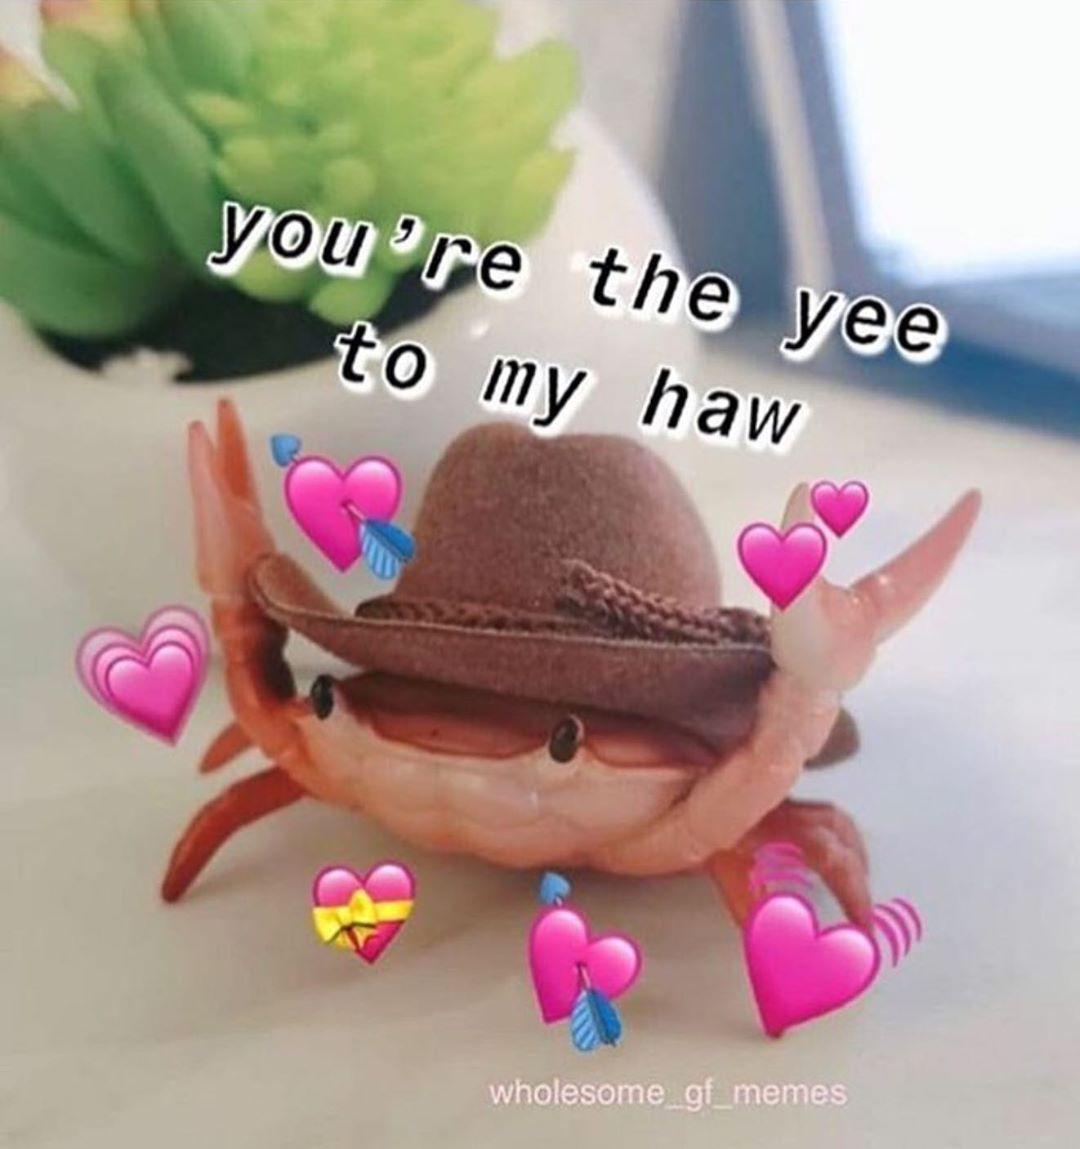 Pin By Saka On Reaction Images Cute Love Memes Cute Memes Love You Meme